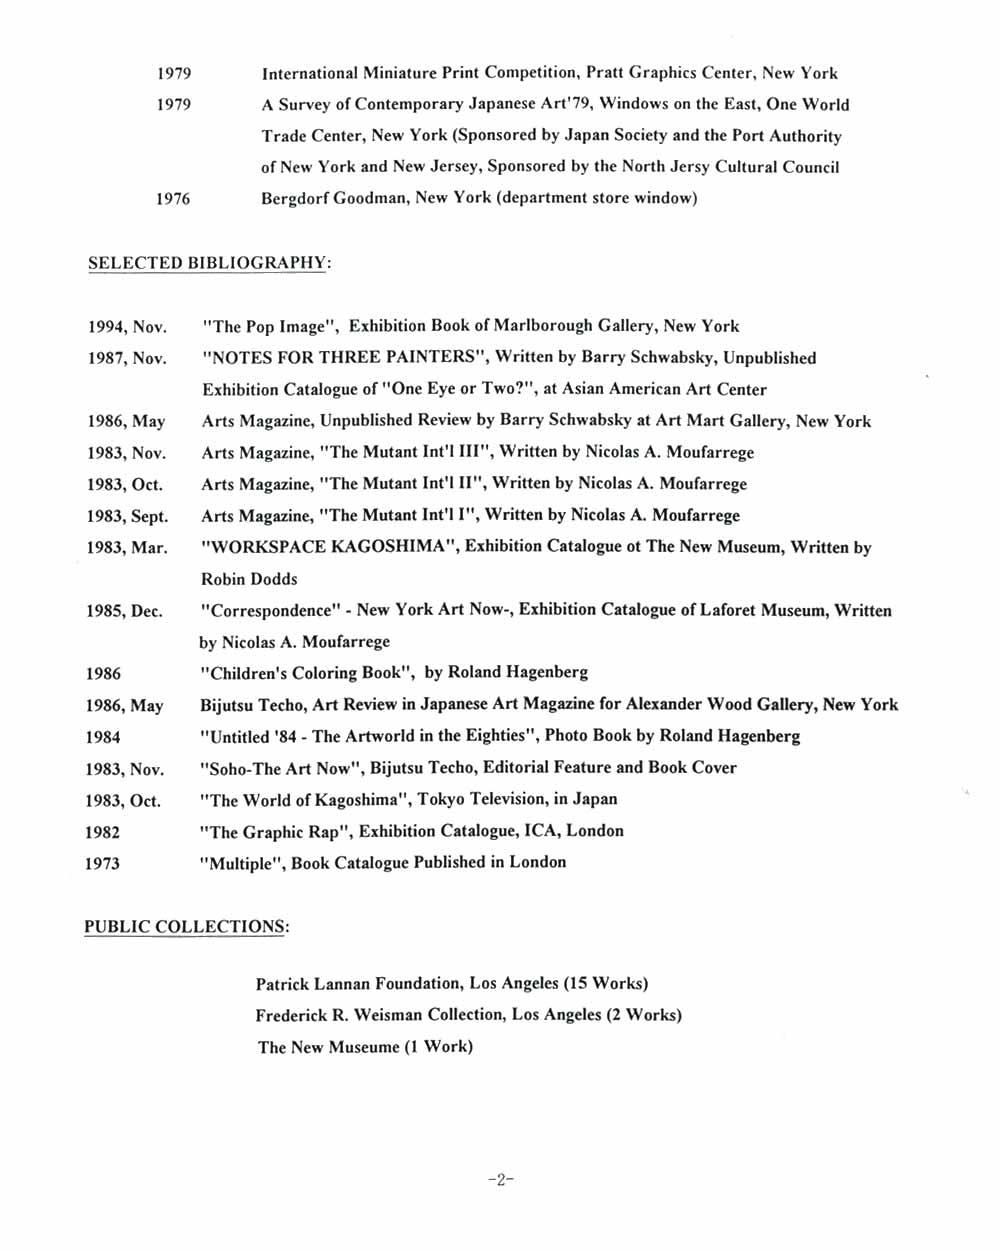 Rocky Kagoshima's Resume, pg 2